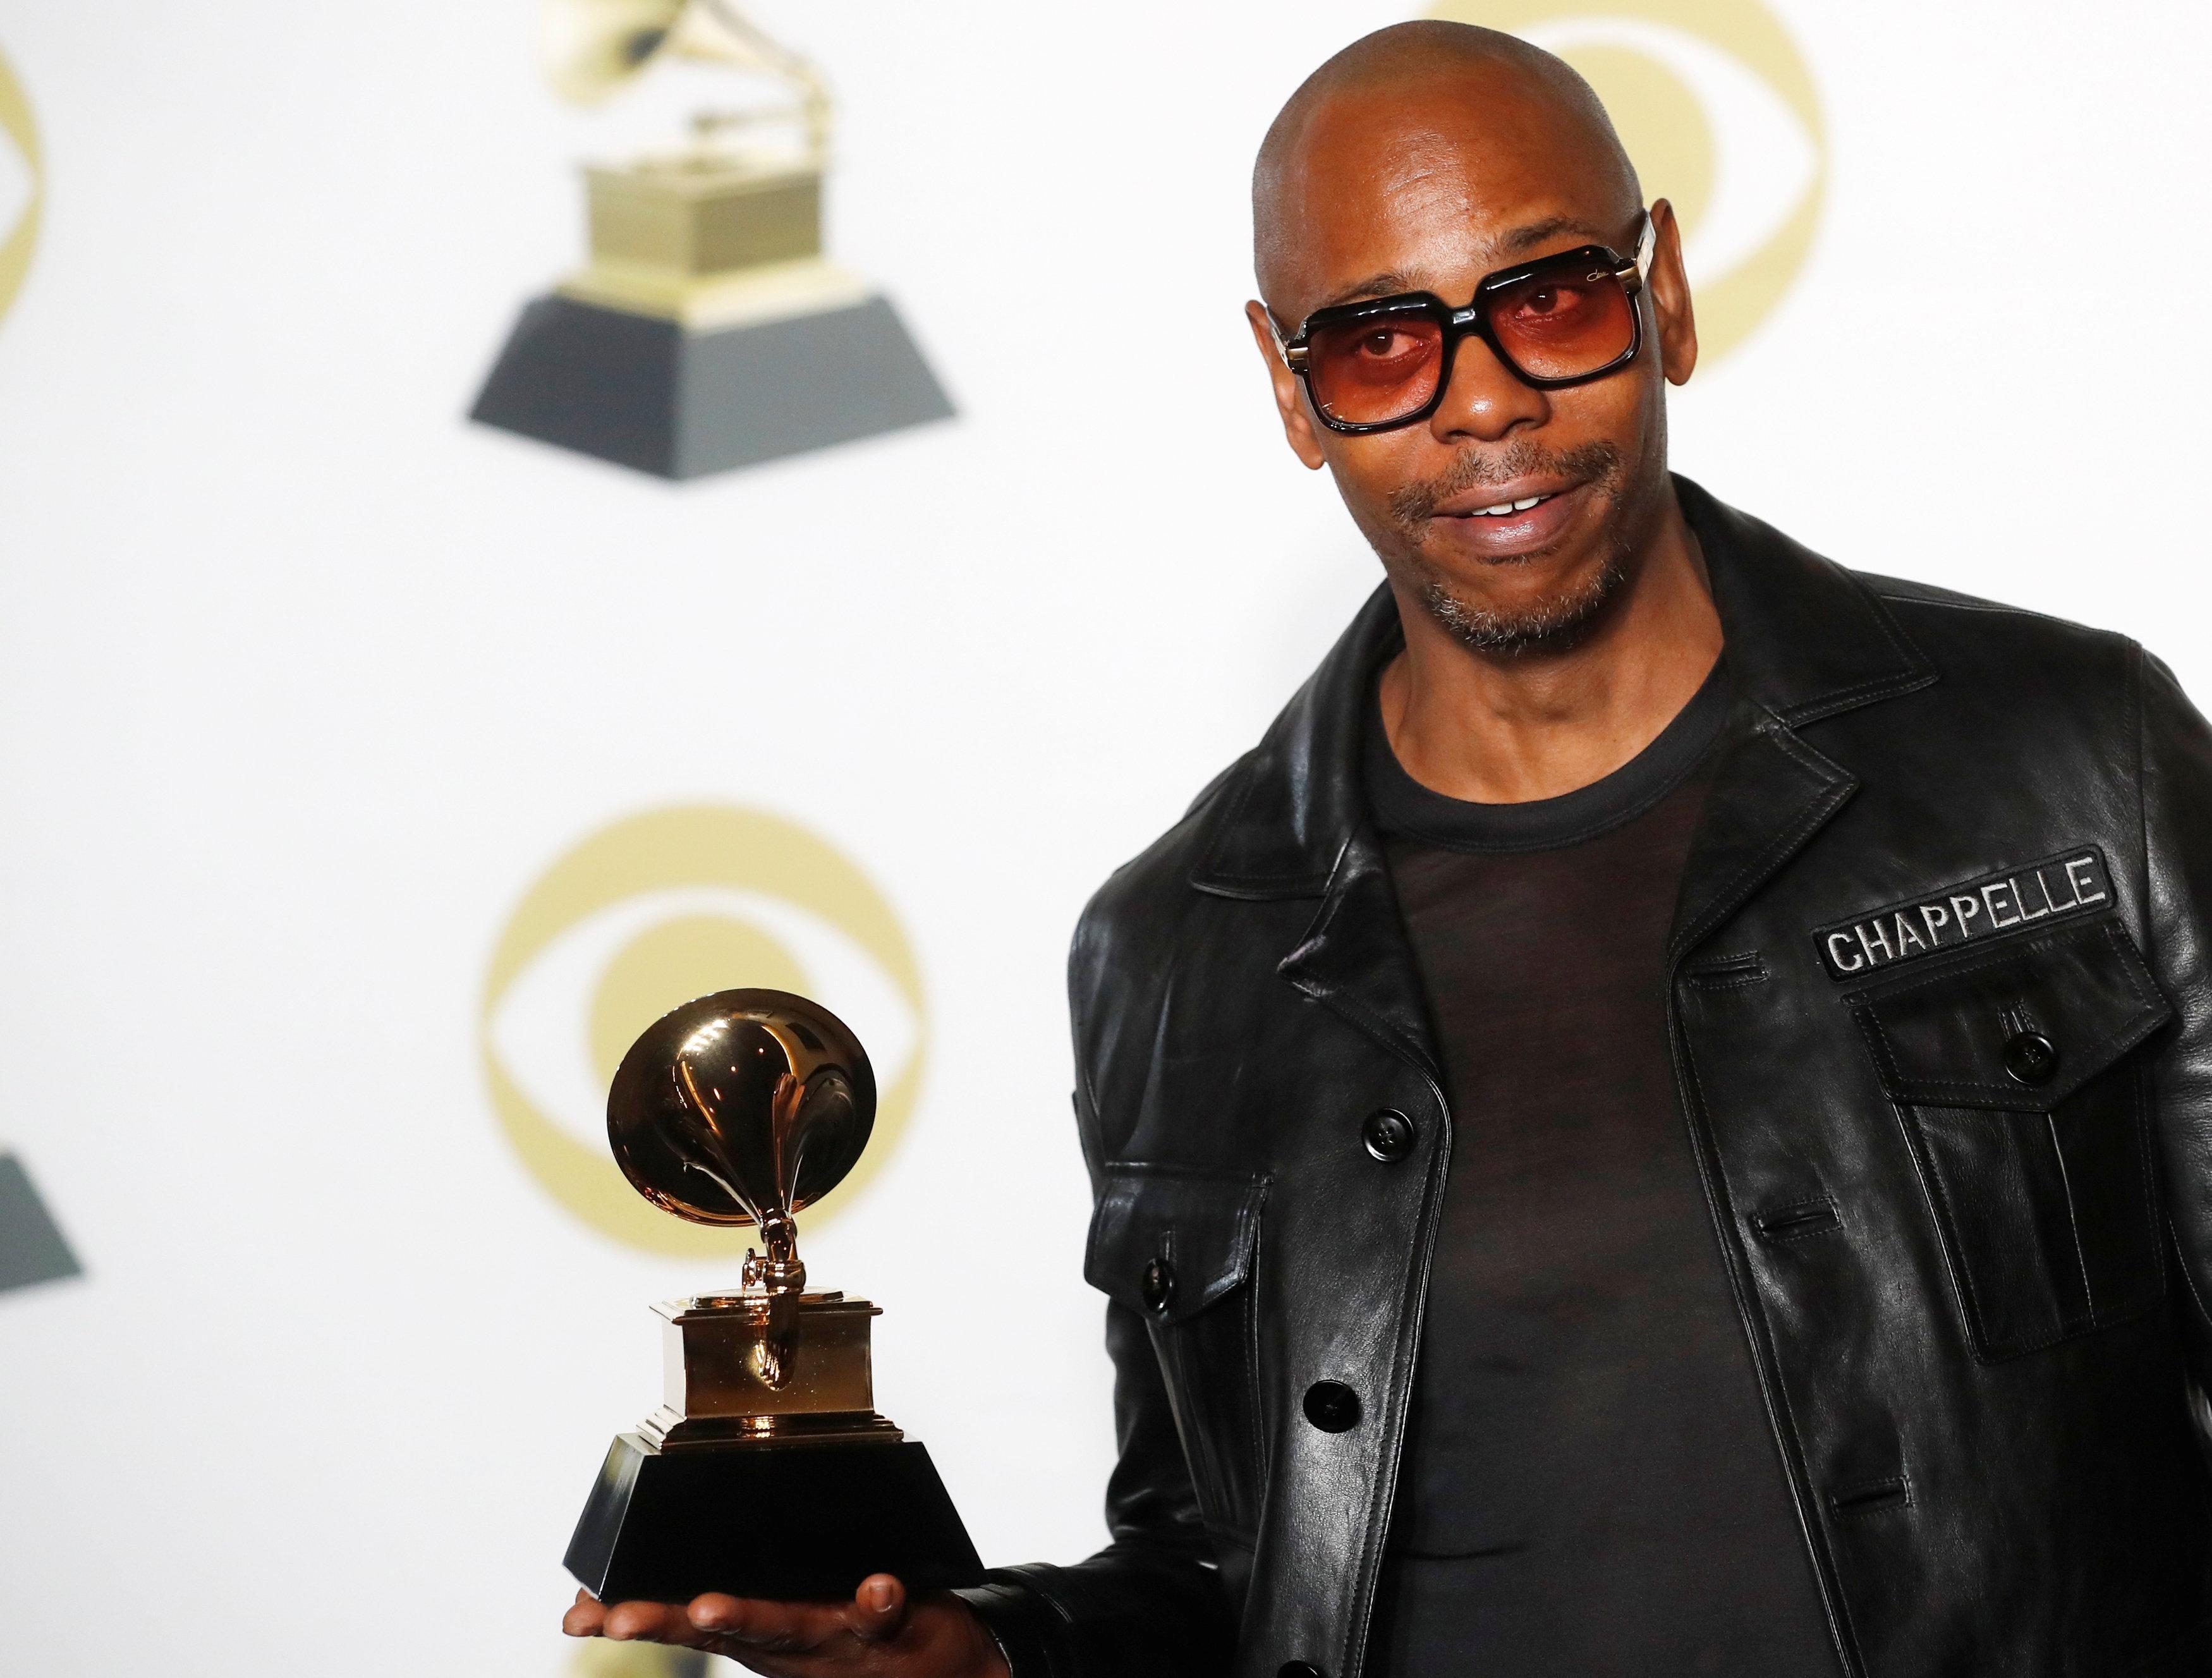 Bruno Mars triumphs at Grammys; Jay-Z is biggest loser | FinanceTime